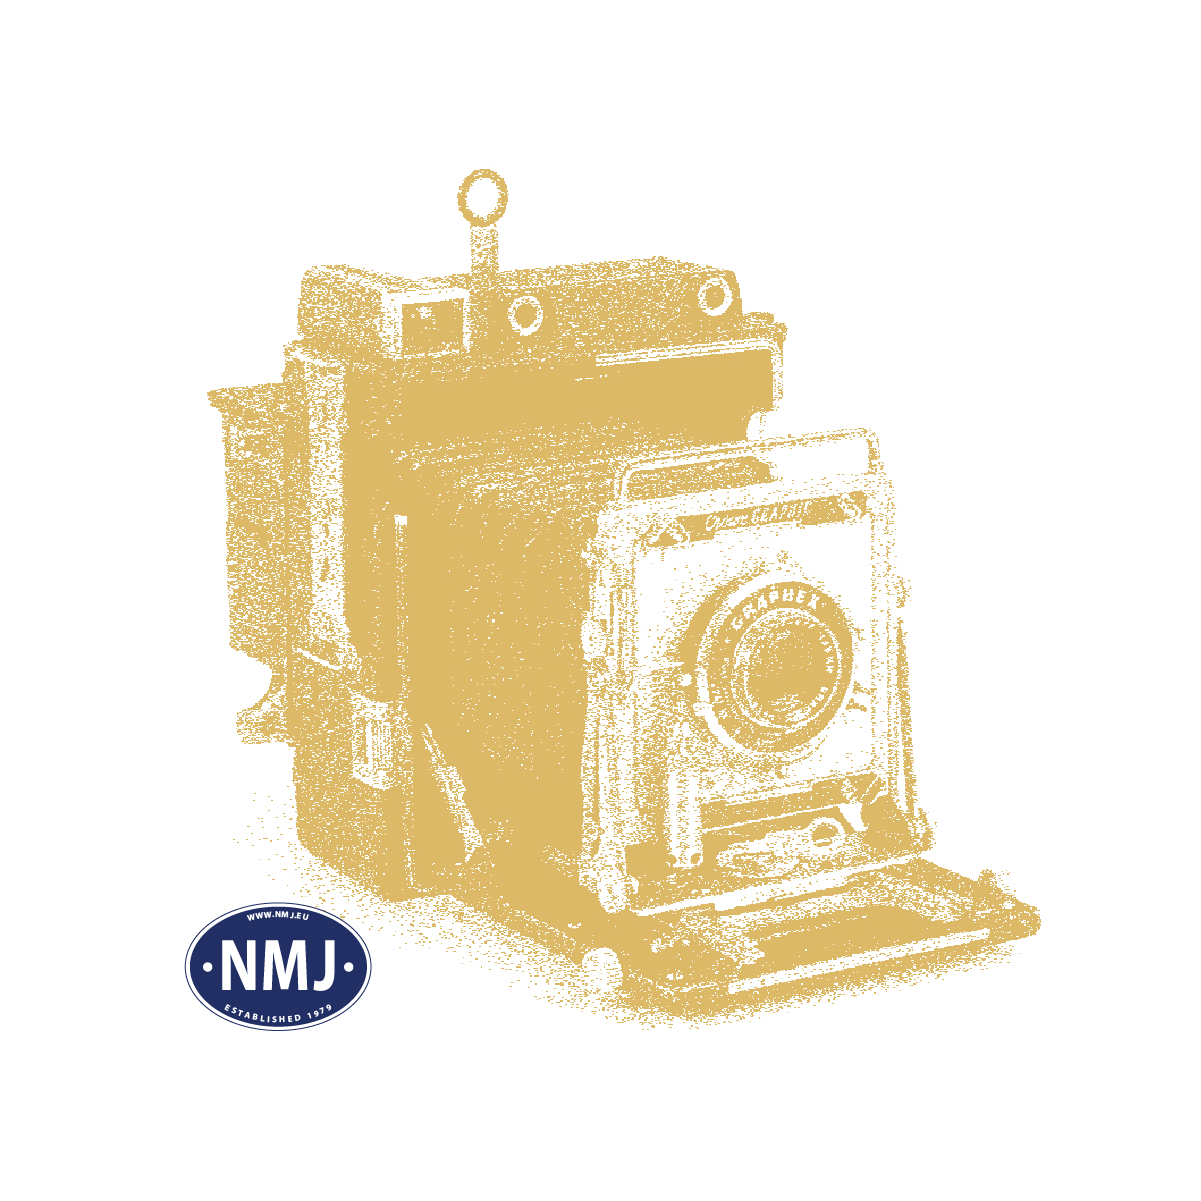 BRA40853 - NSB Damplok Type 61a 3431, AC Digital